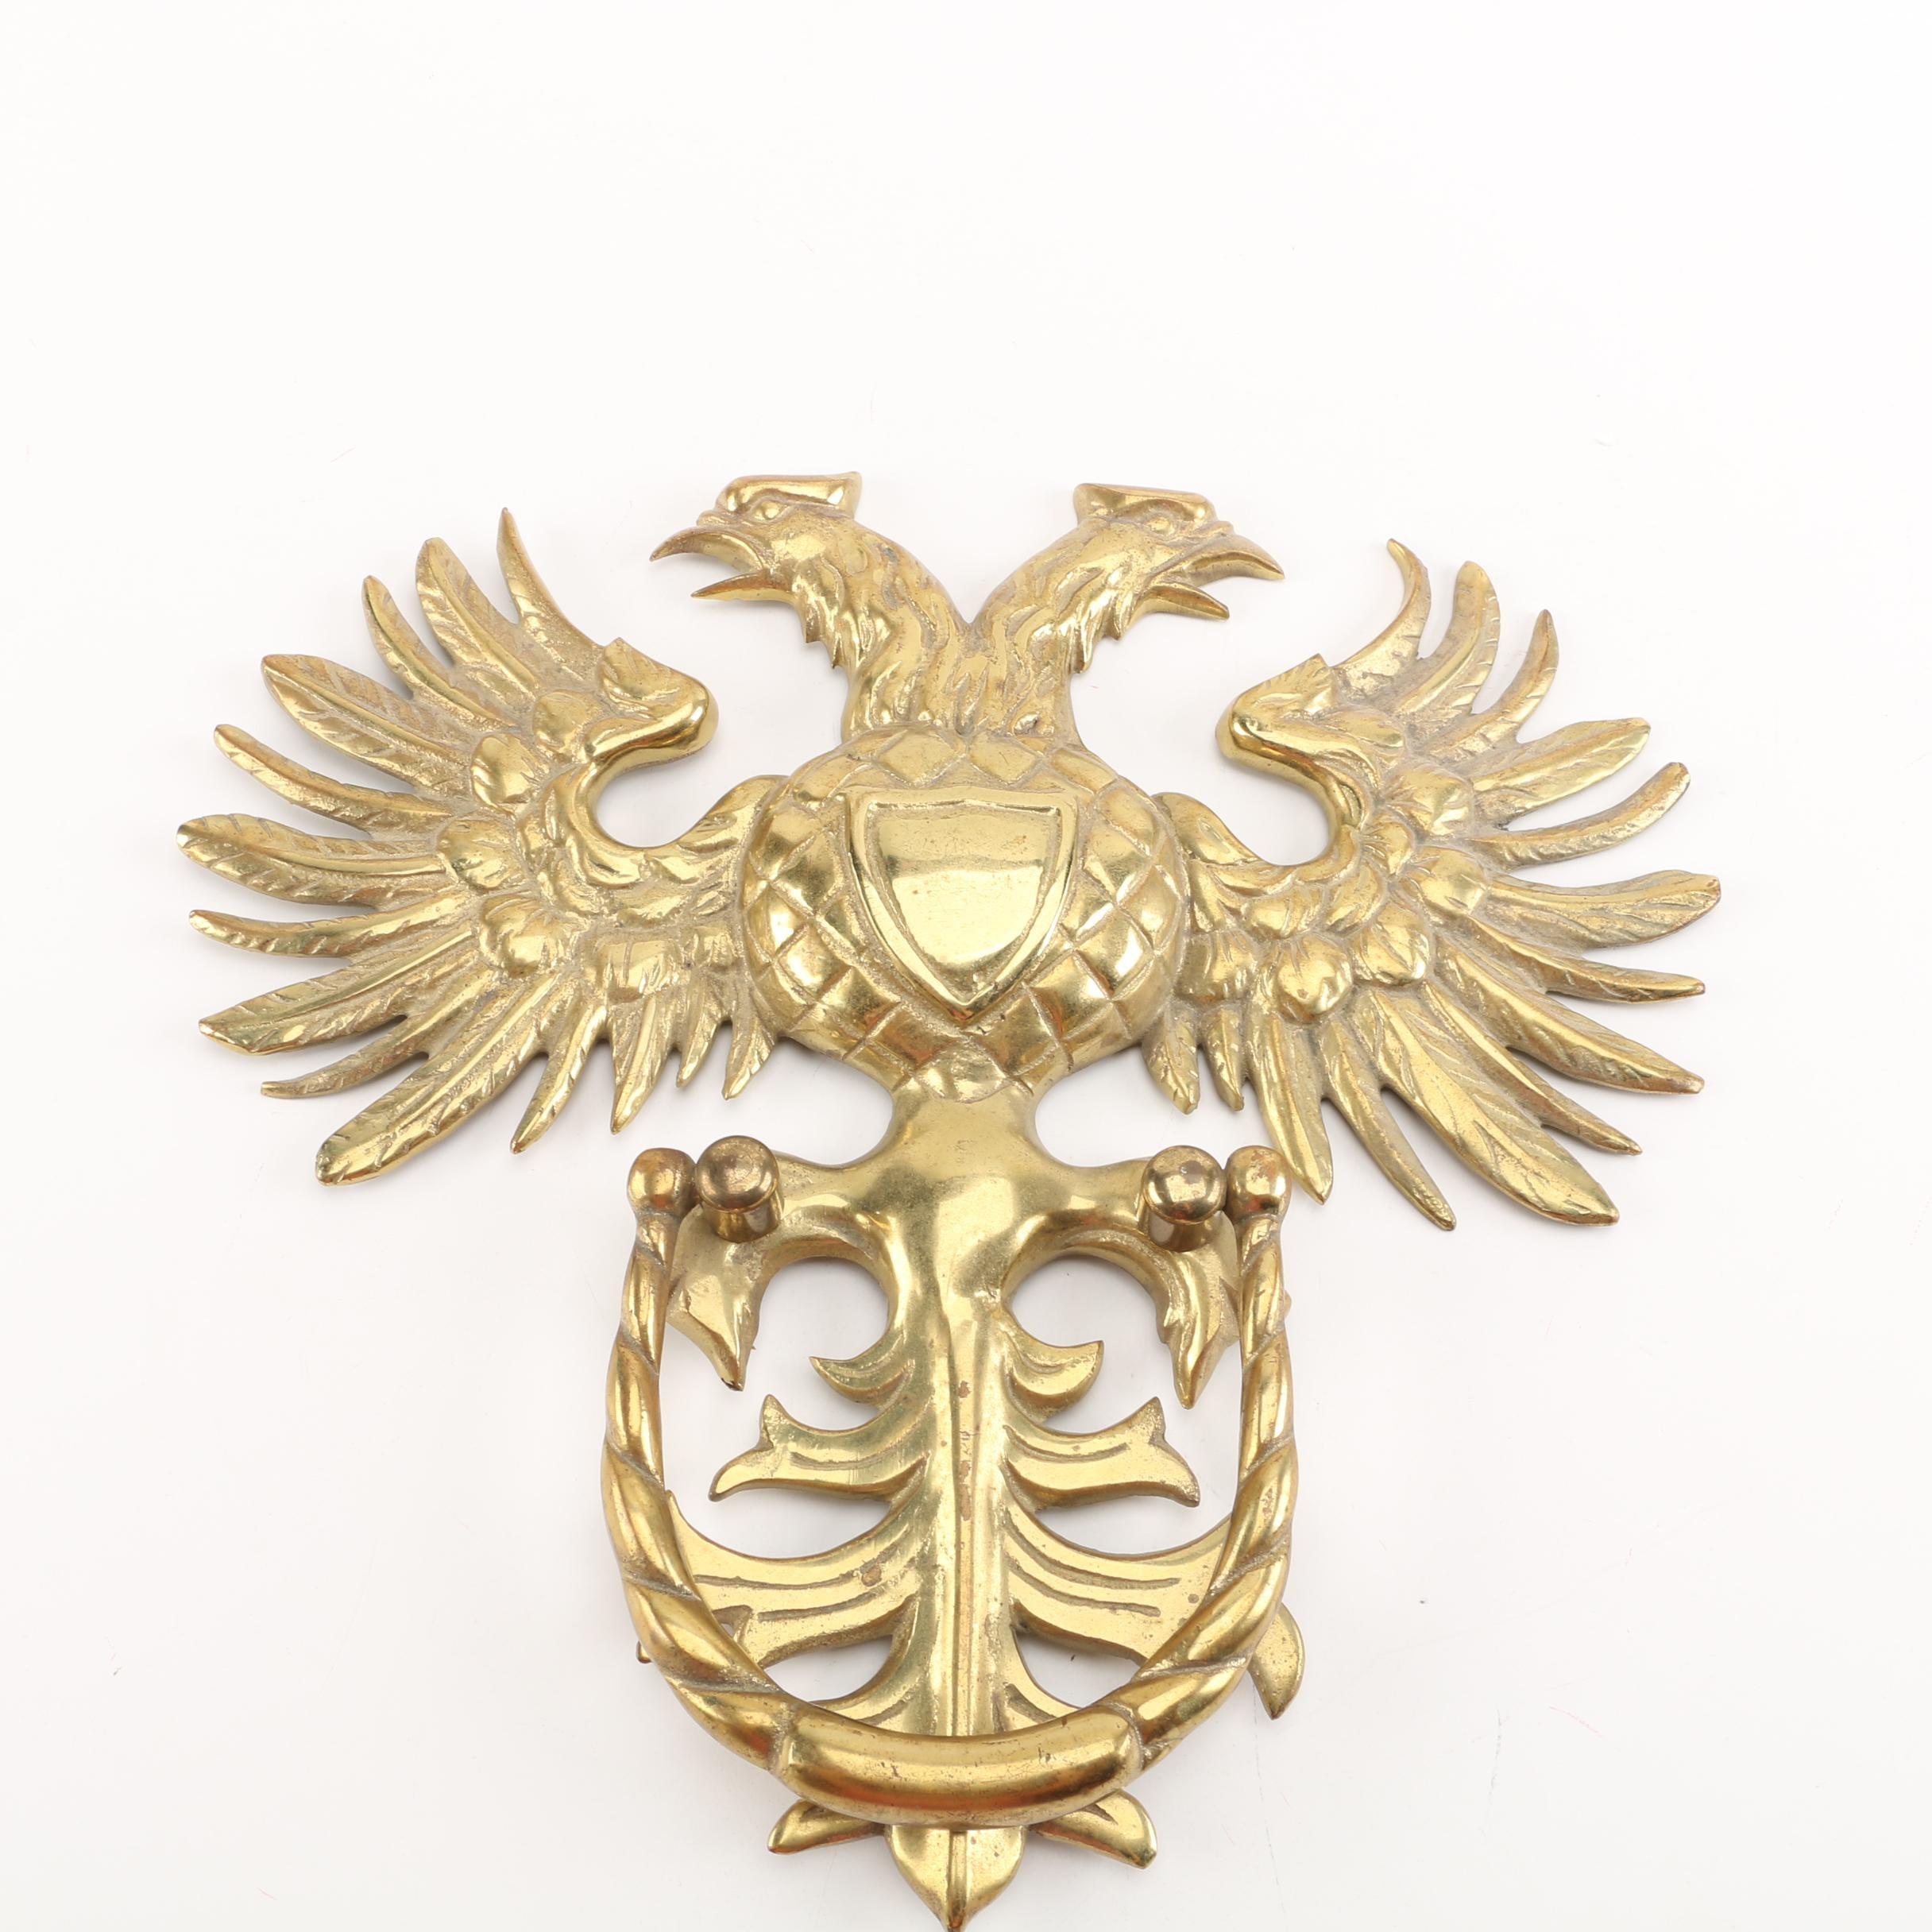 Gold Tone Double Headed Eagle Door Knocker